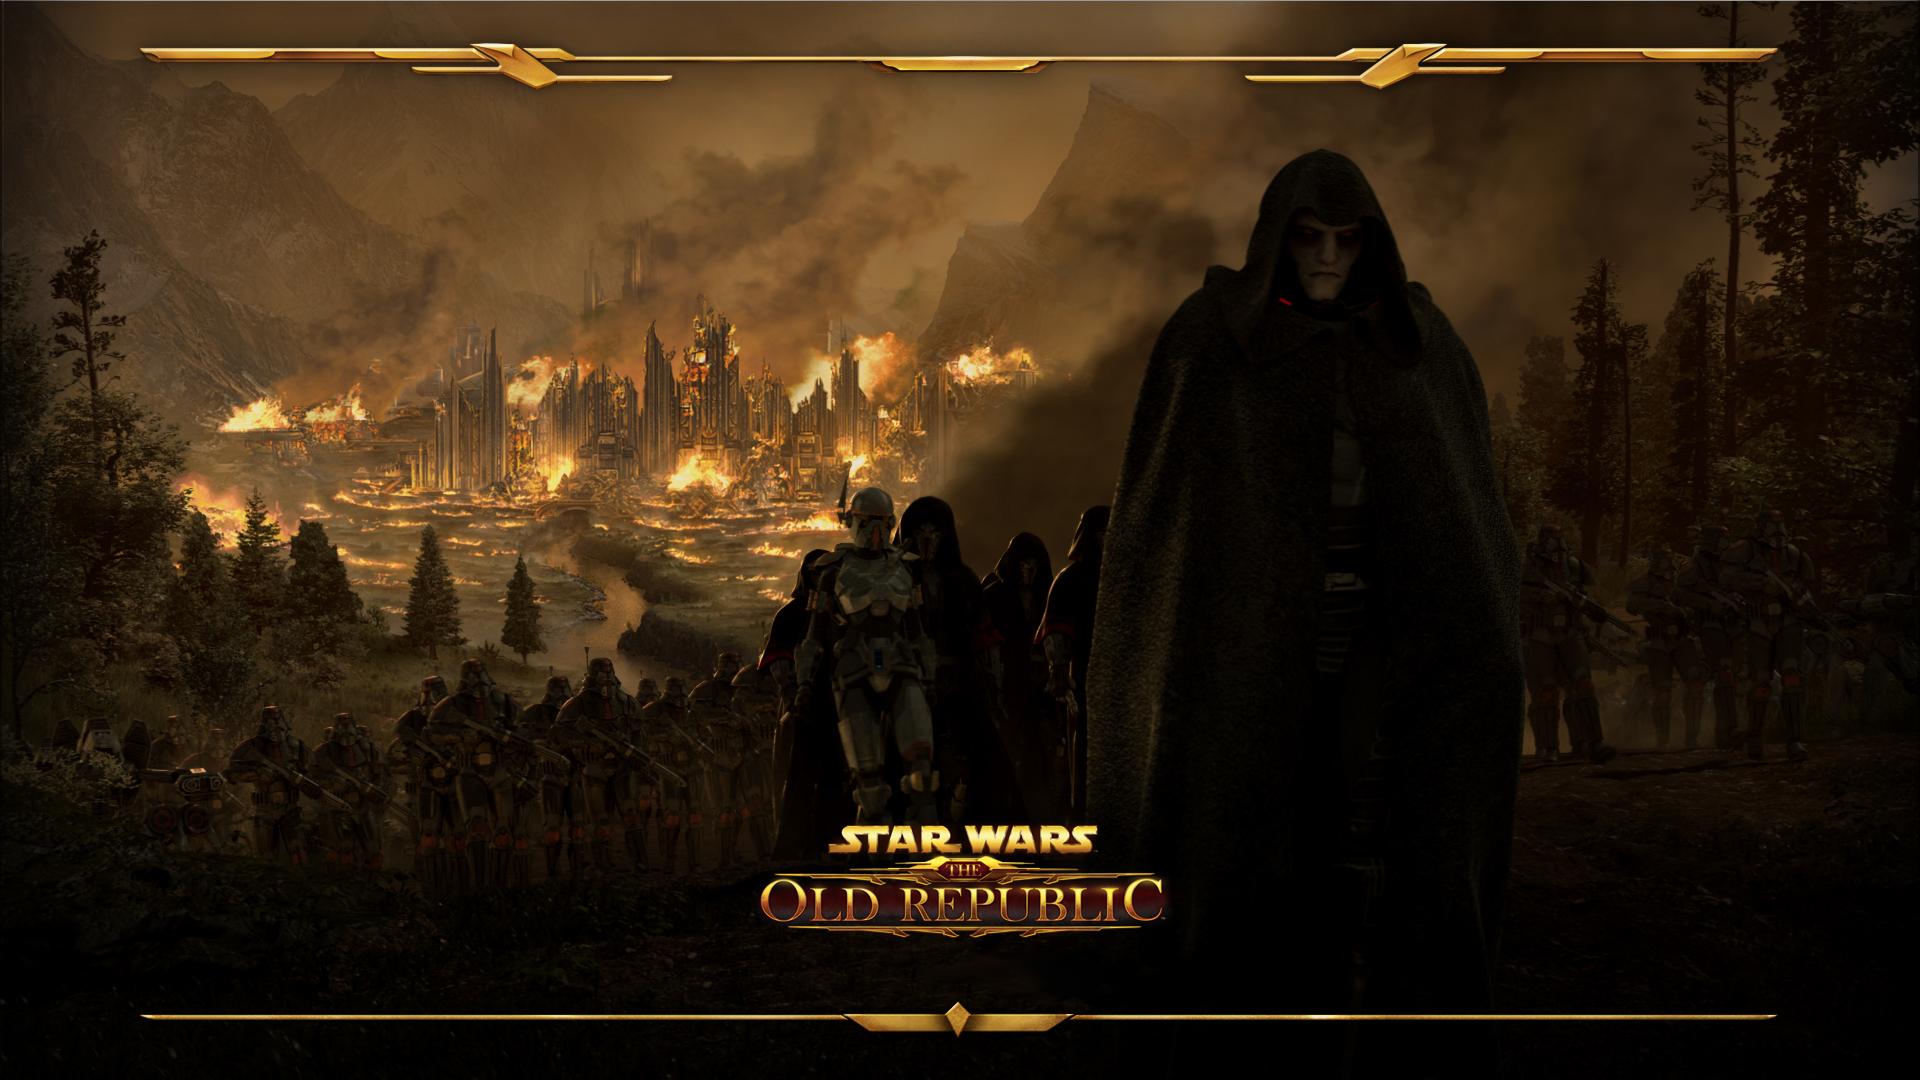 Star Wars: The Old Republic pierde 400,000 suscriptores.